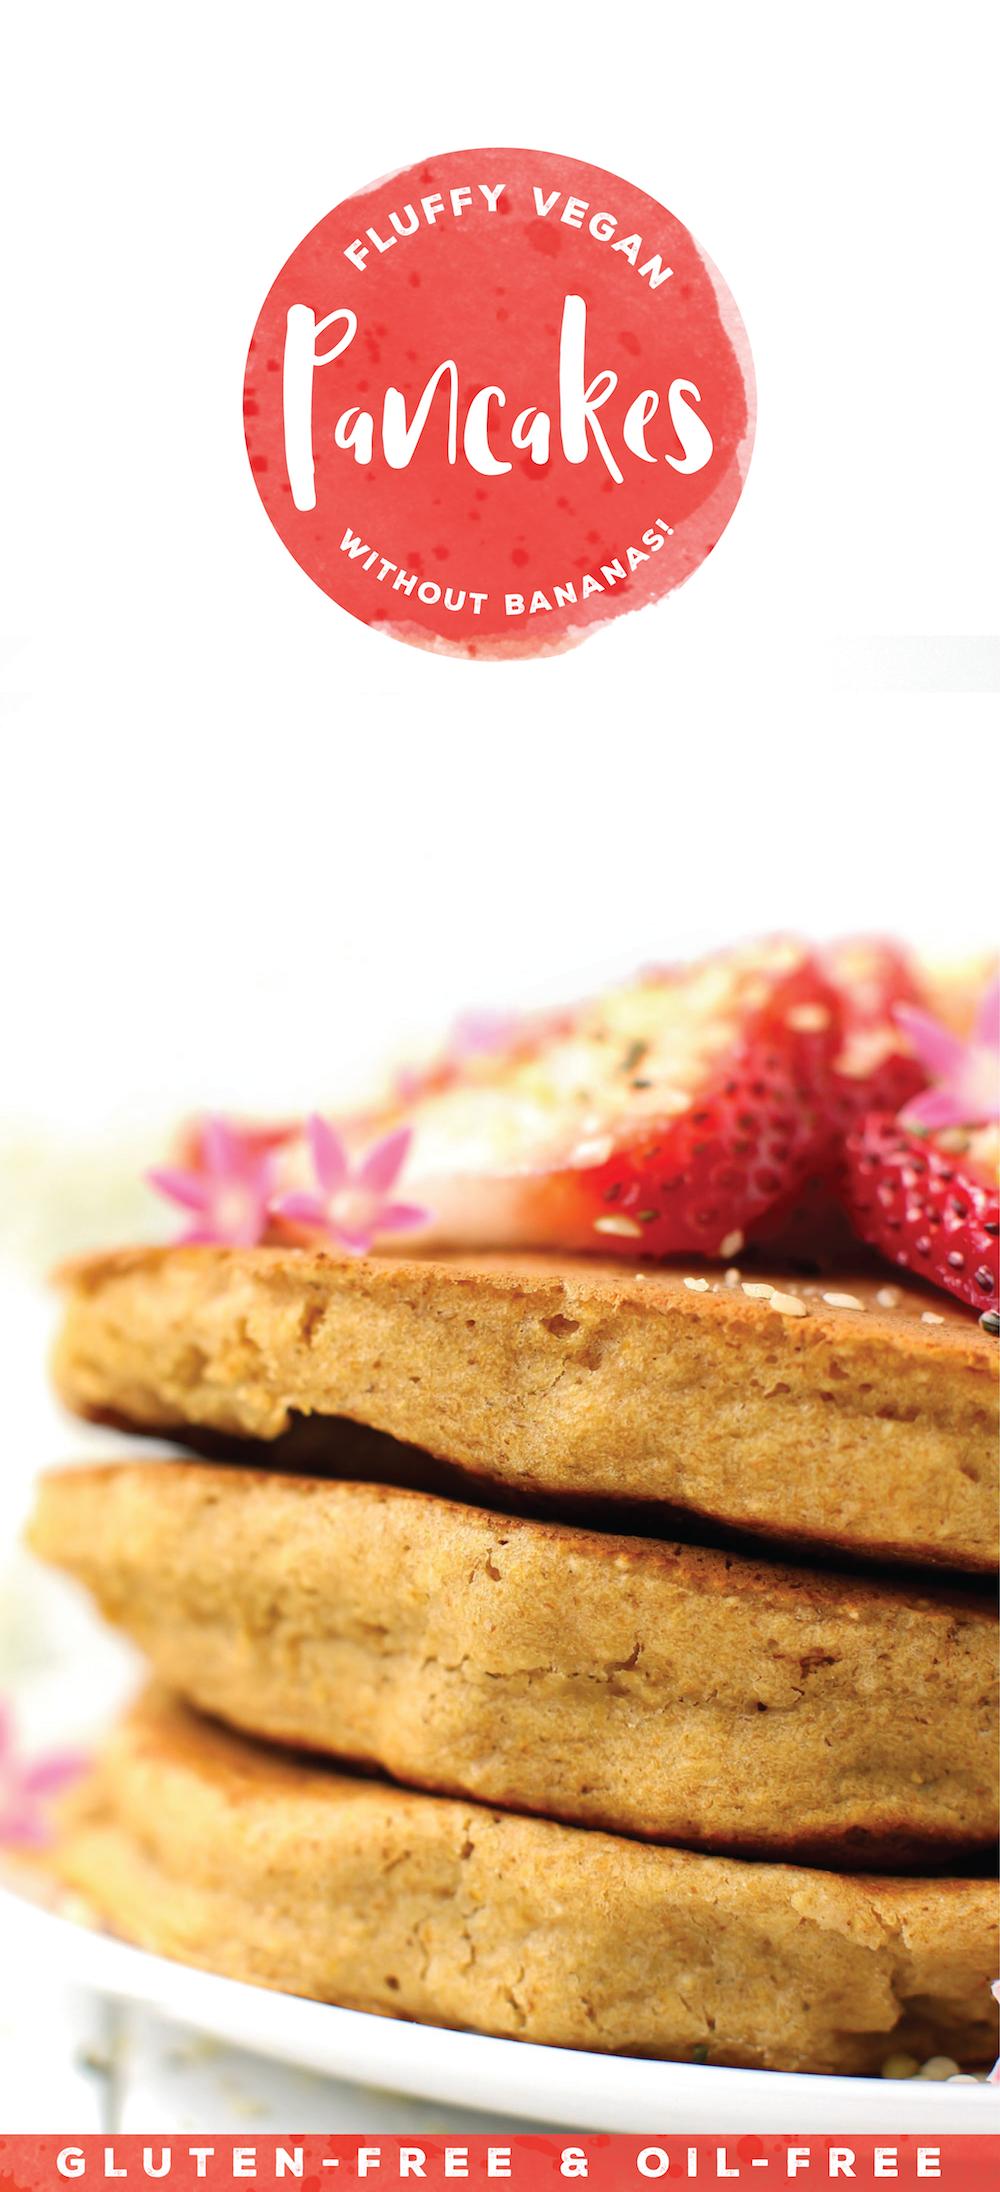 Fluffy Vegan Pancakes Without Banana Gluten And Oil Free Recipe Fluffy Vegan Pancakes Vegan Pancakes Food